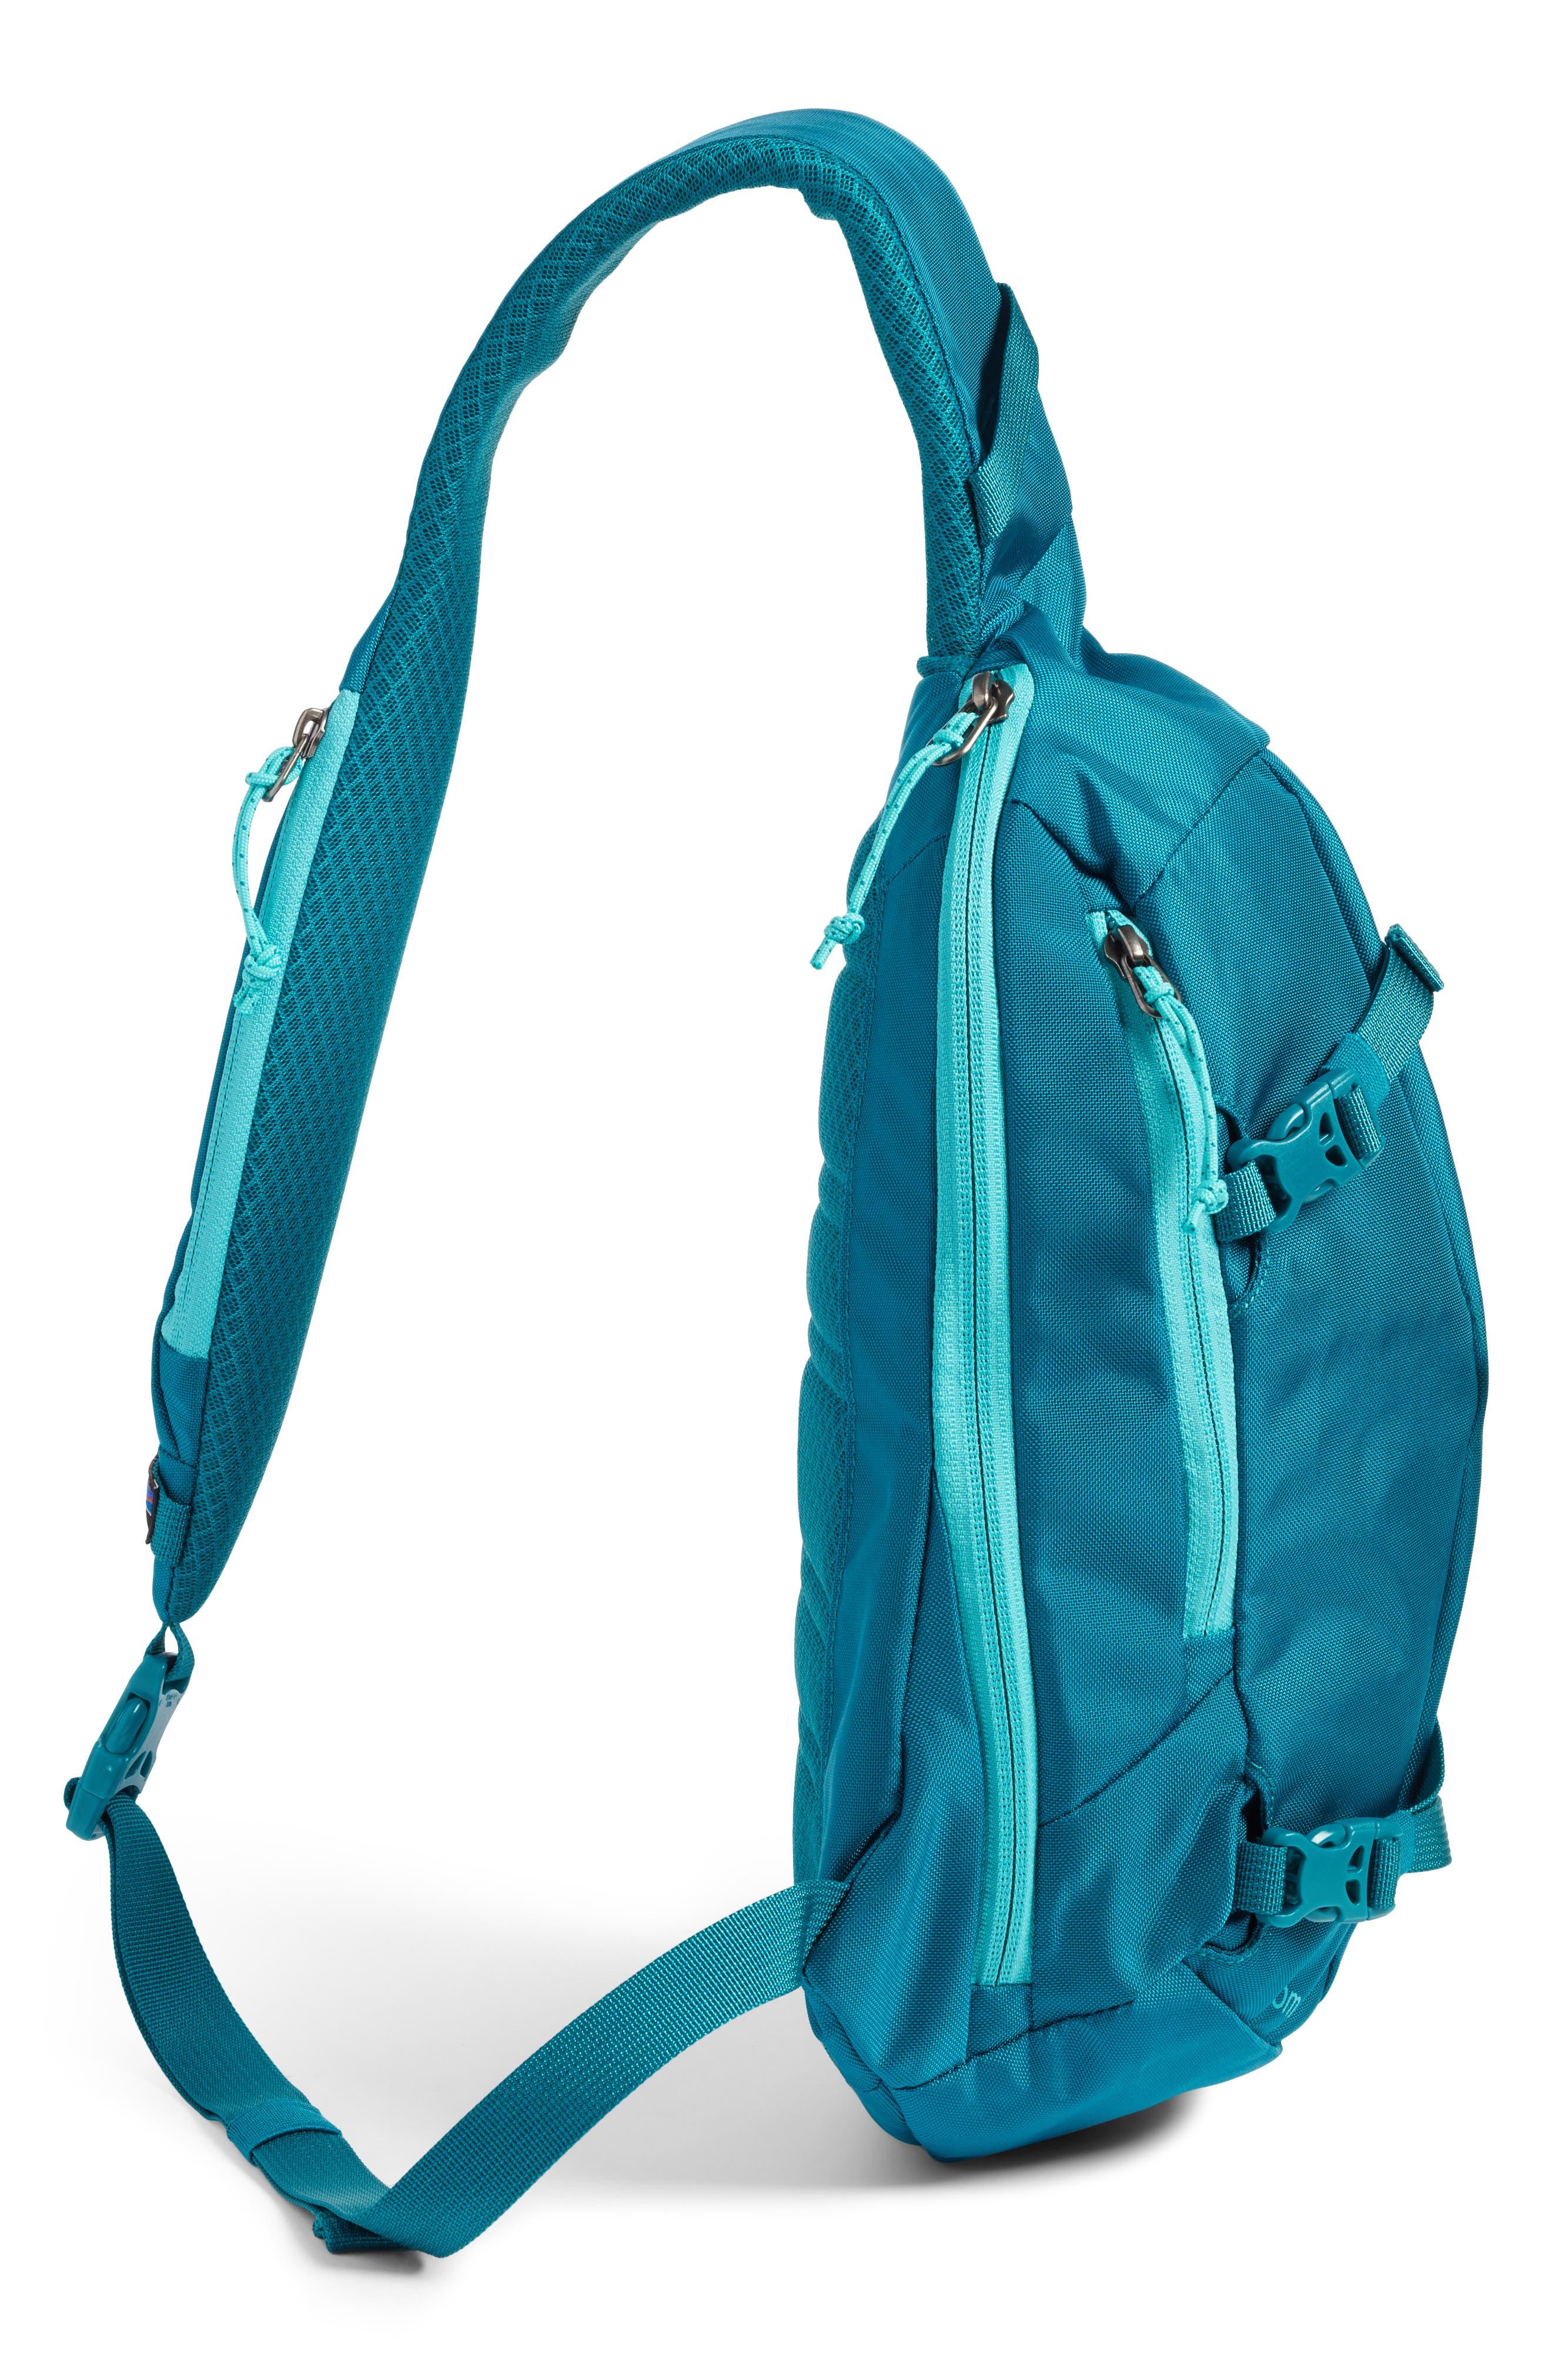 Atom 8L Sling Backpack,                             Alternate thumbnail 5, color,                             Elwha Blue